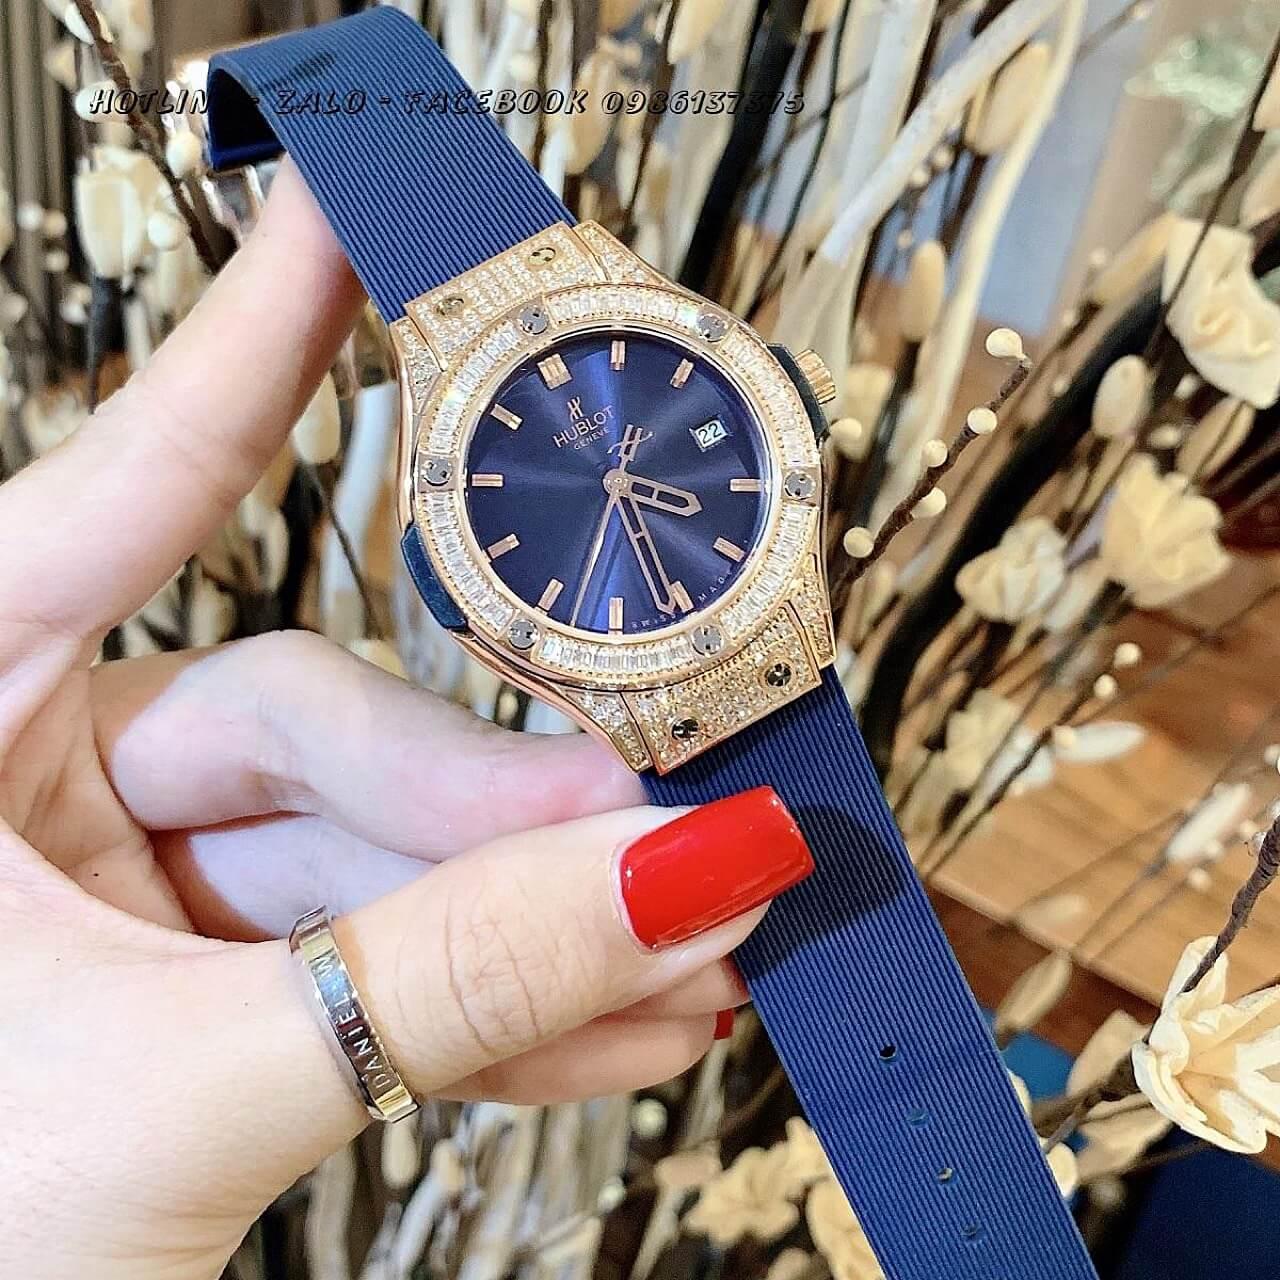 Đồng Hồ Hublot Nữ Silicon Blue Rose Gold 34mm